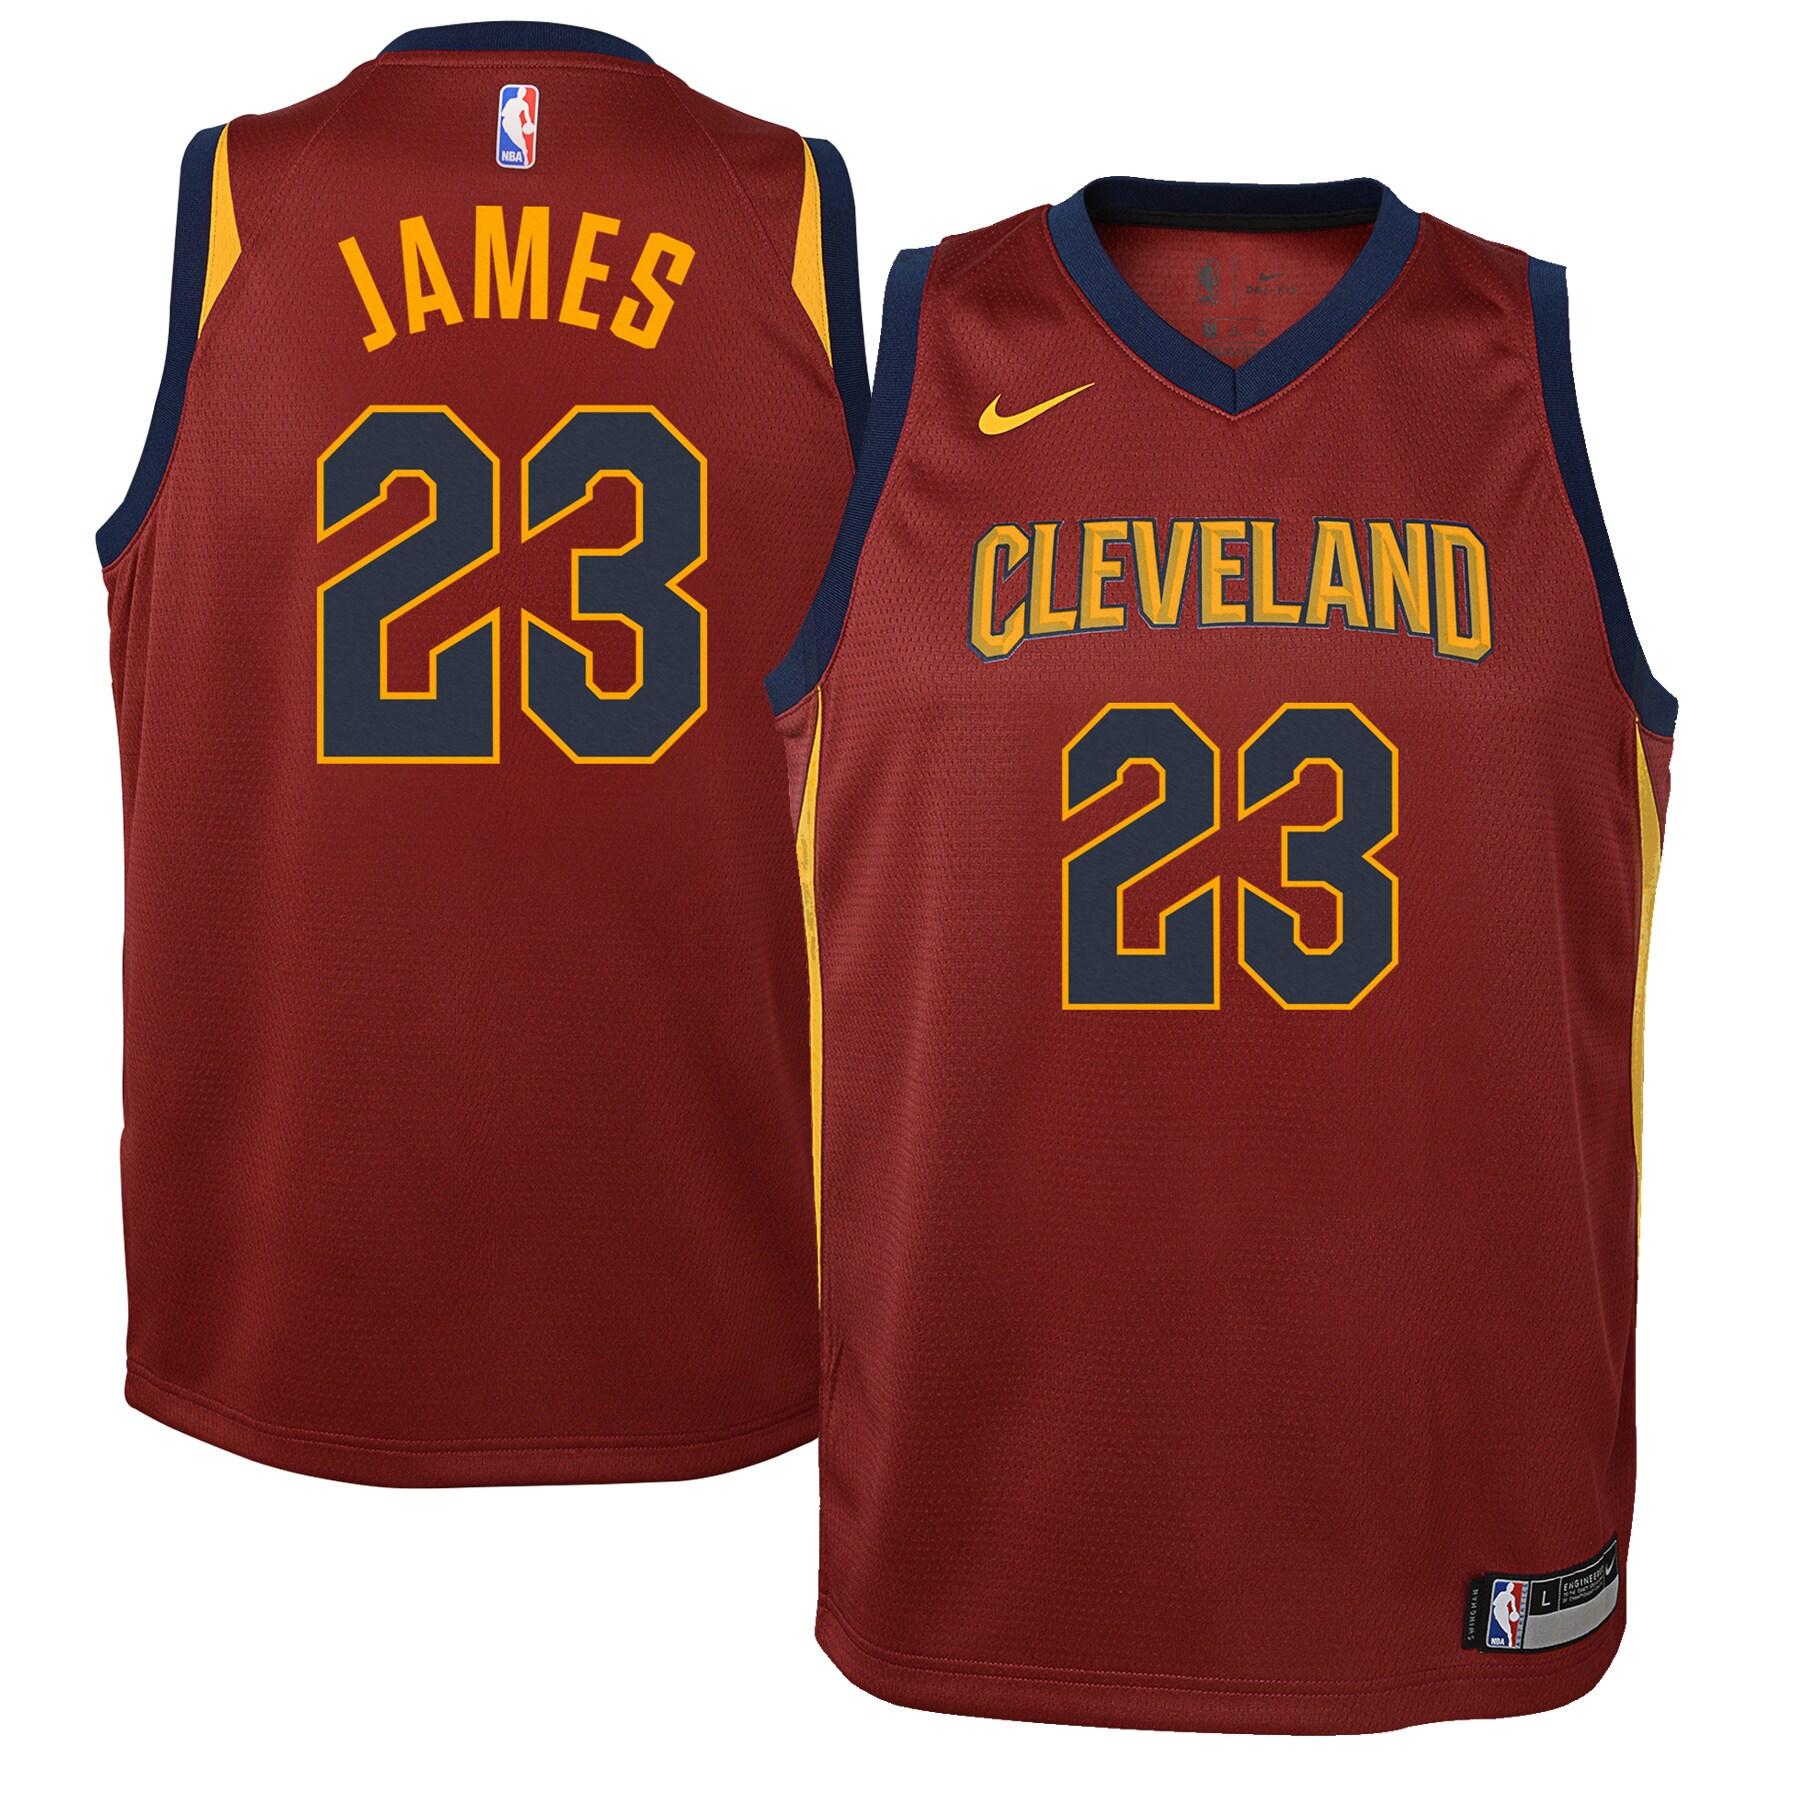 LeBron James Cleveland Cavaliers Nike Youth Swingman Jersey Maroon - Icon Edition